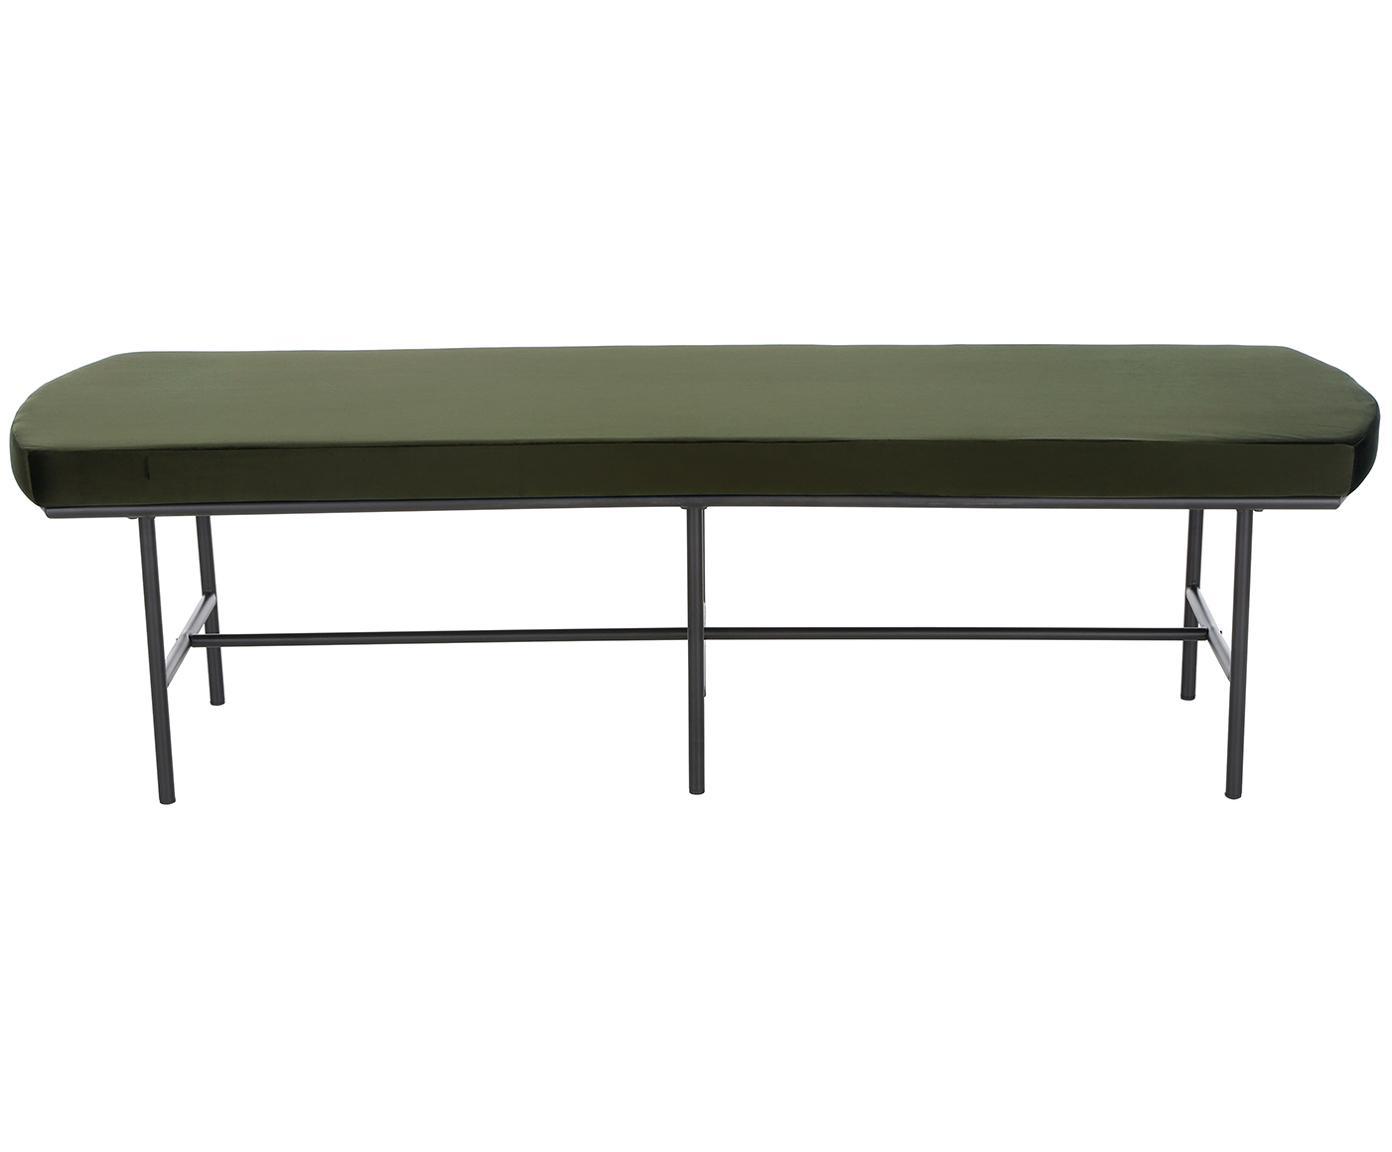 Samt-Bank Jasper, Bezug: Samt (Polyester) 20.000 S, Beine: Metall, pulverbeschichtet, Dunkelgrün, 160 x 45 cm